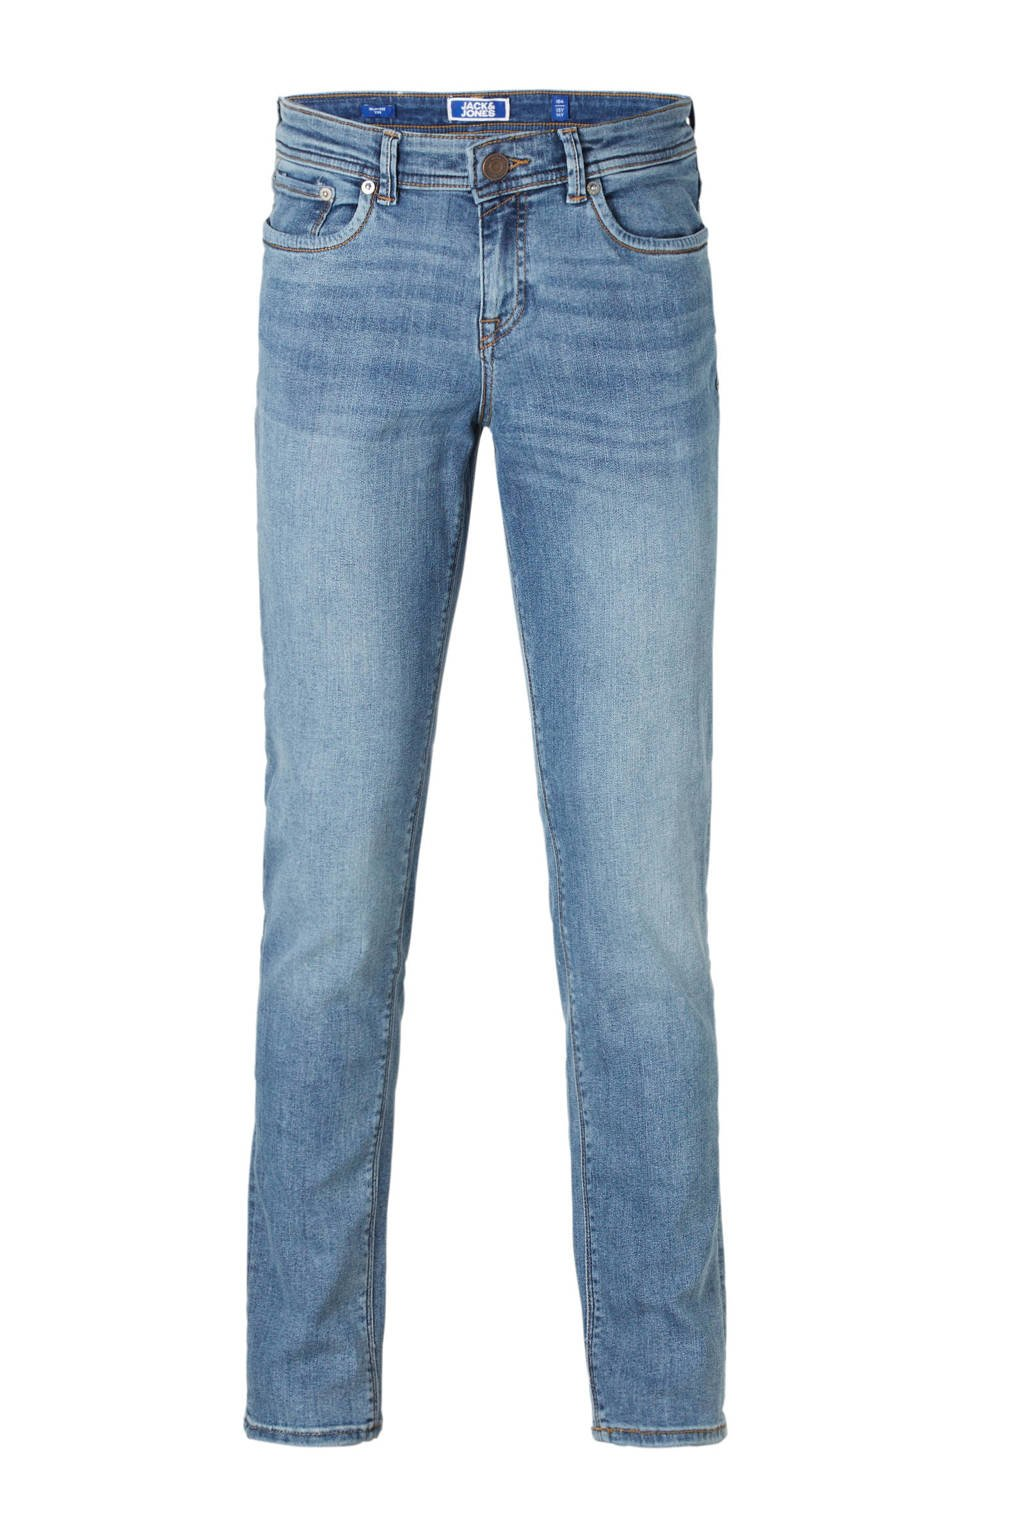 Jack & Jones Junior slim fit jeans Tim, Light blue denim